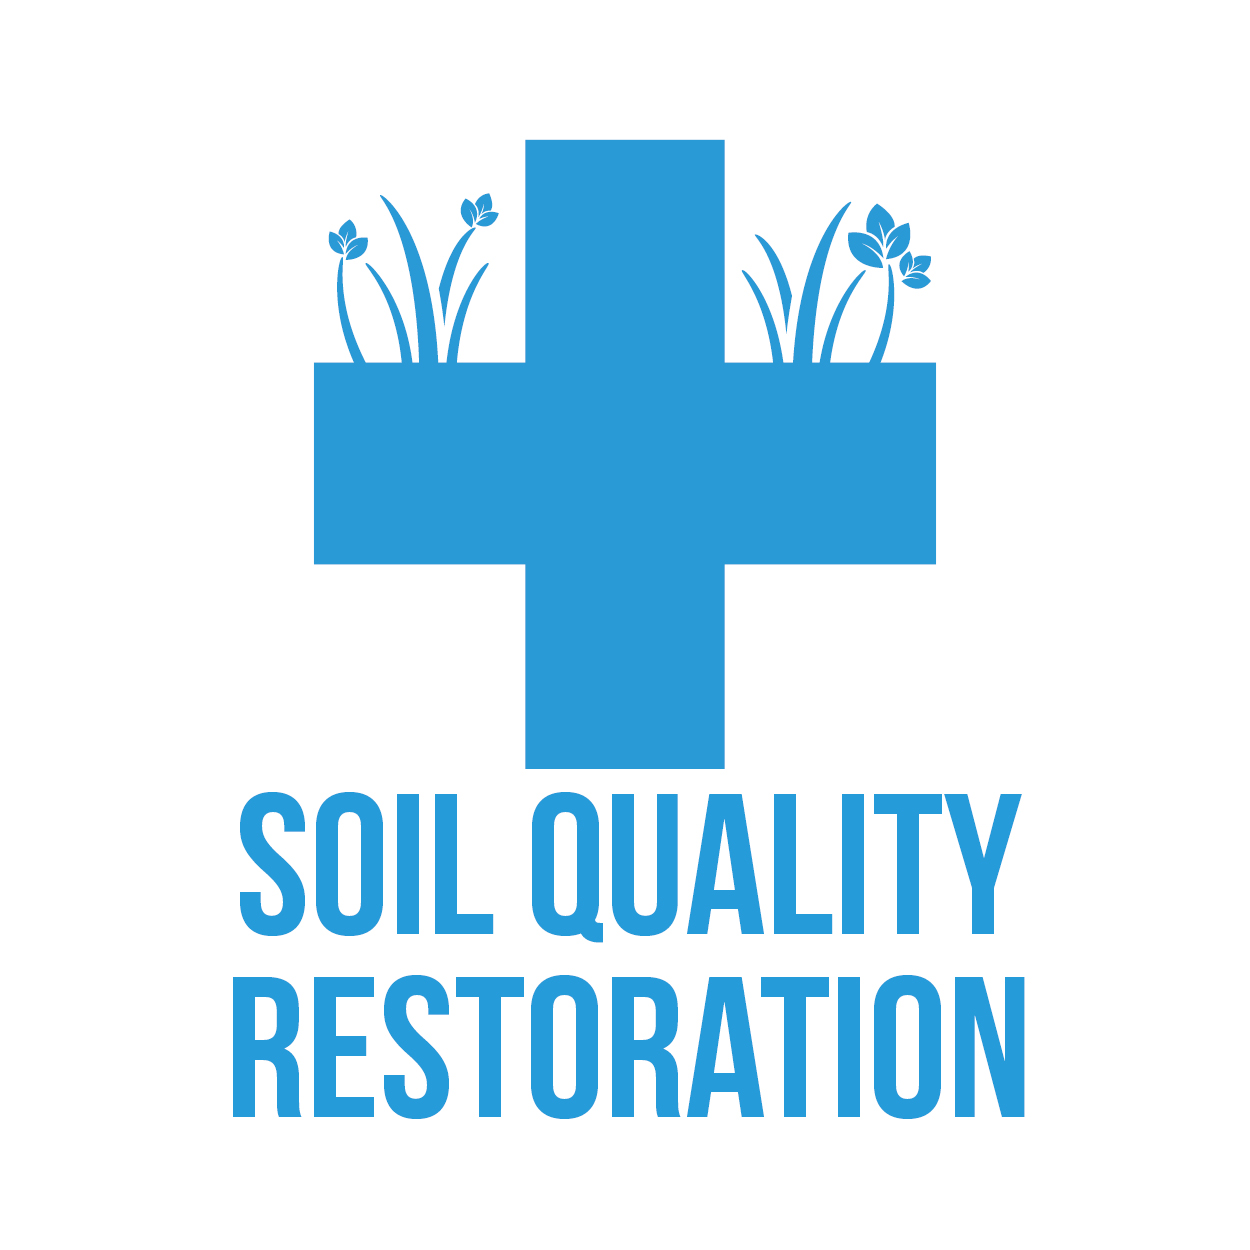 icon-soilqualityrestoration-square.jpg